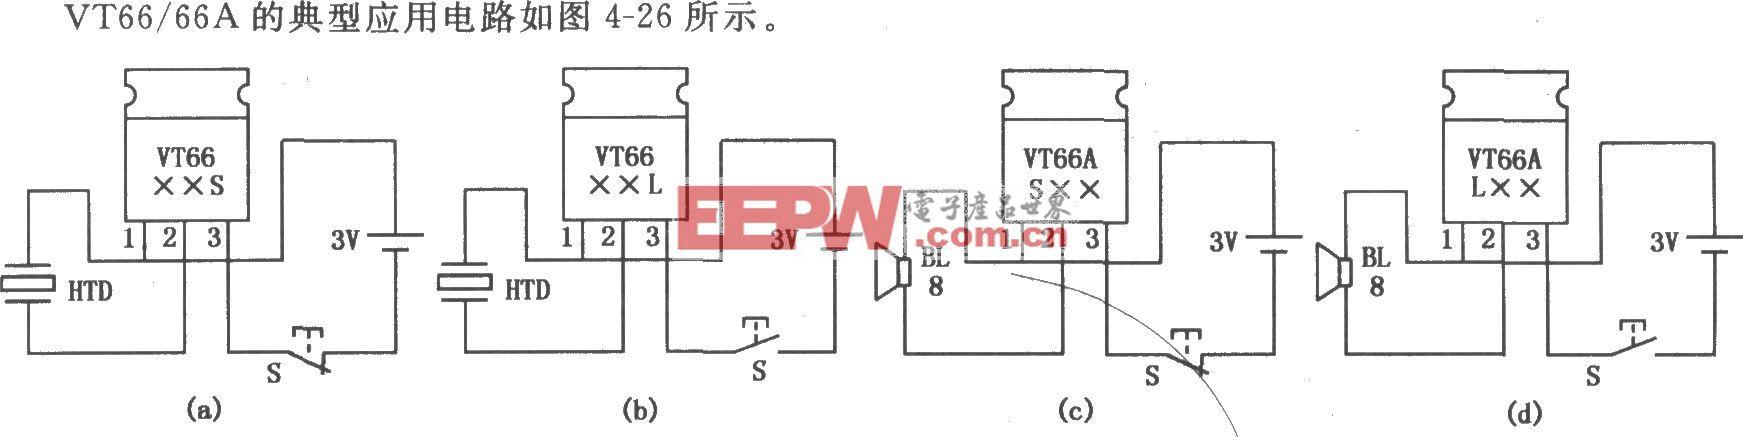 VT66/66A三极管型音乐集成电路